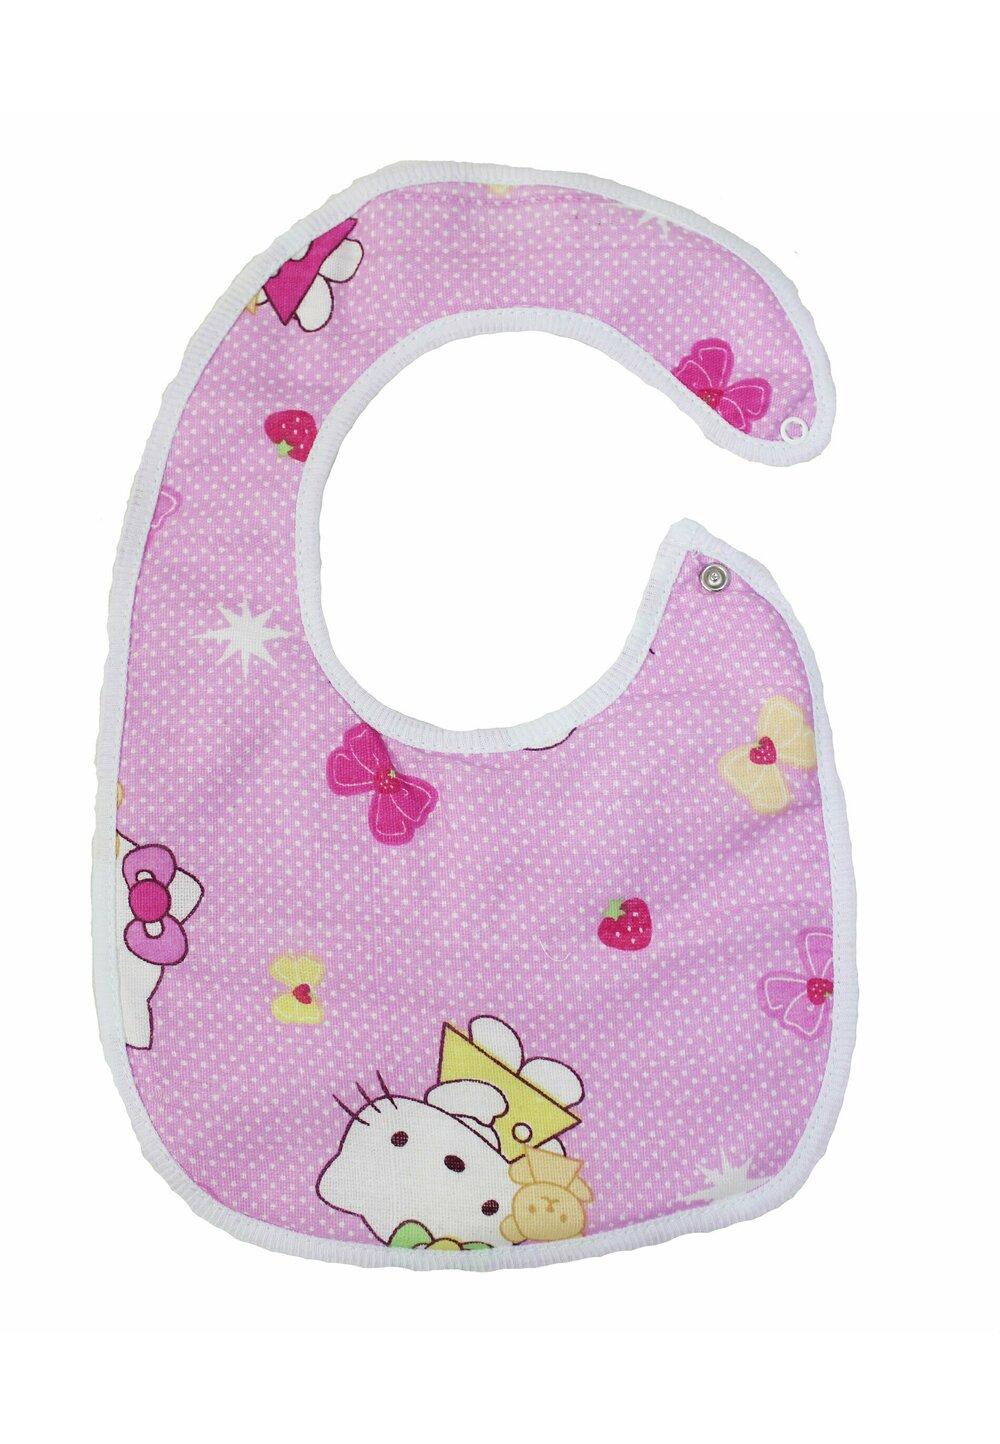 Baveta bebe, Hello Kitty, roz deschis, 6-12 luni imagine